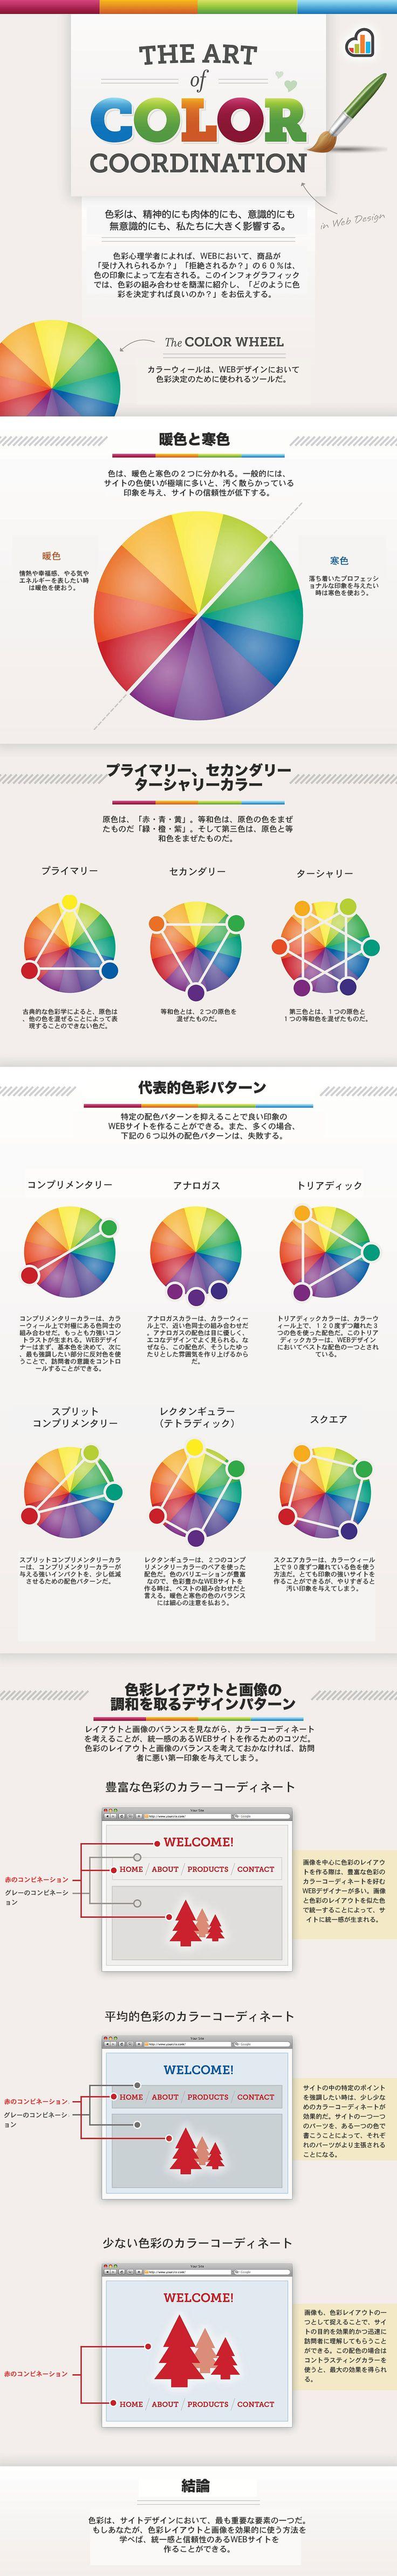 -- Japanese translation version -- 最低限覚えておきたいWEB配色の基本2大原理と6つの配色パターン http://bazubu.com/colorpttn-2507.html?utm_source=feedburner_medium=feed_campaign=Feed%3A+bazubu%2Ffeed+%28%E3%83%90%E3%82%BA%E9%83%A8%29#